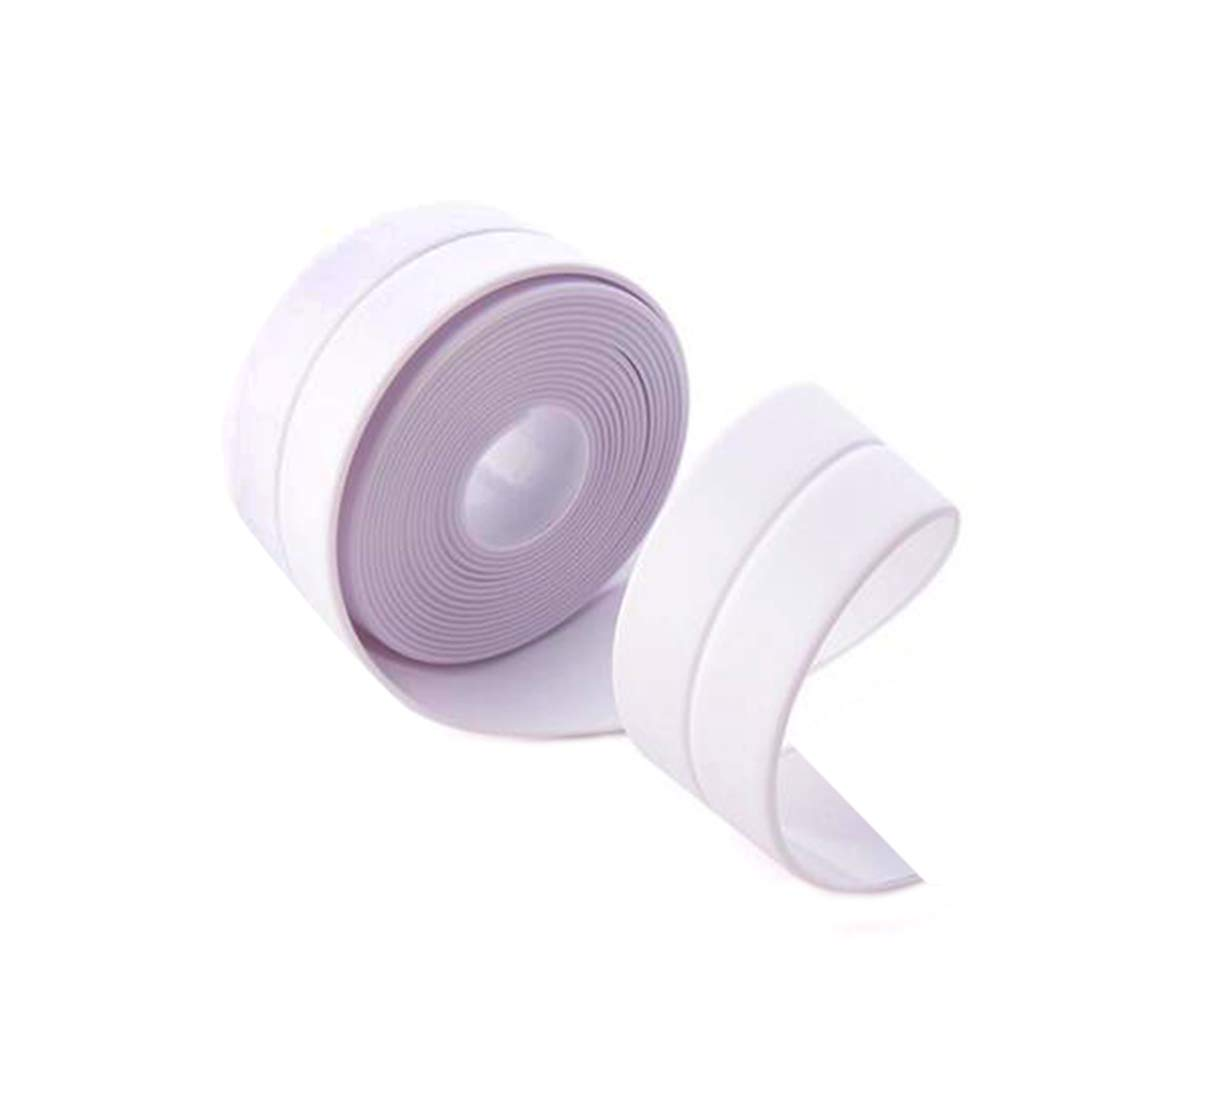 Self Adhesive Caulk Strip, Tub and Wall Sealing Tape Caulking Sealant Decorative Trim for Bathroom, Kitchen and Toilet, 38 mm x 3.2 m (White)